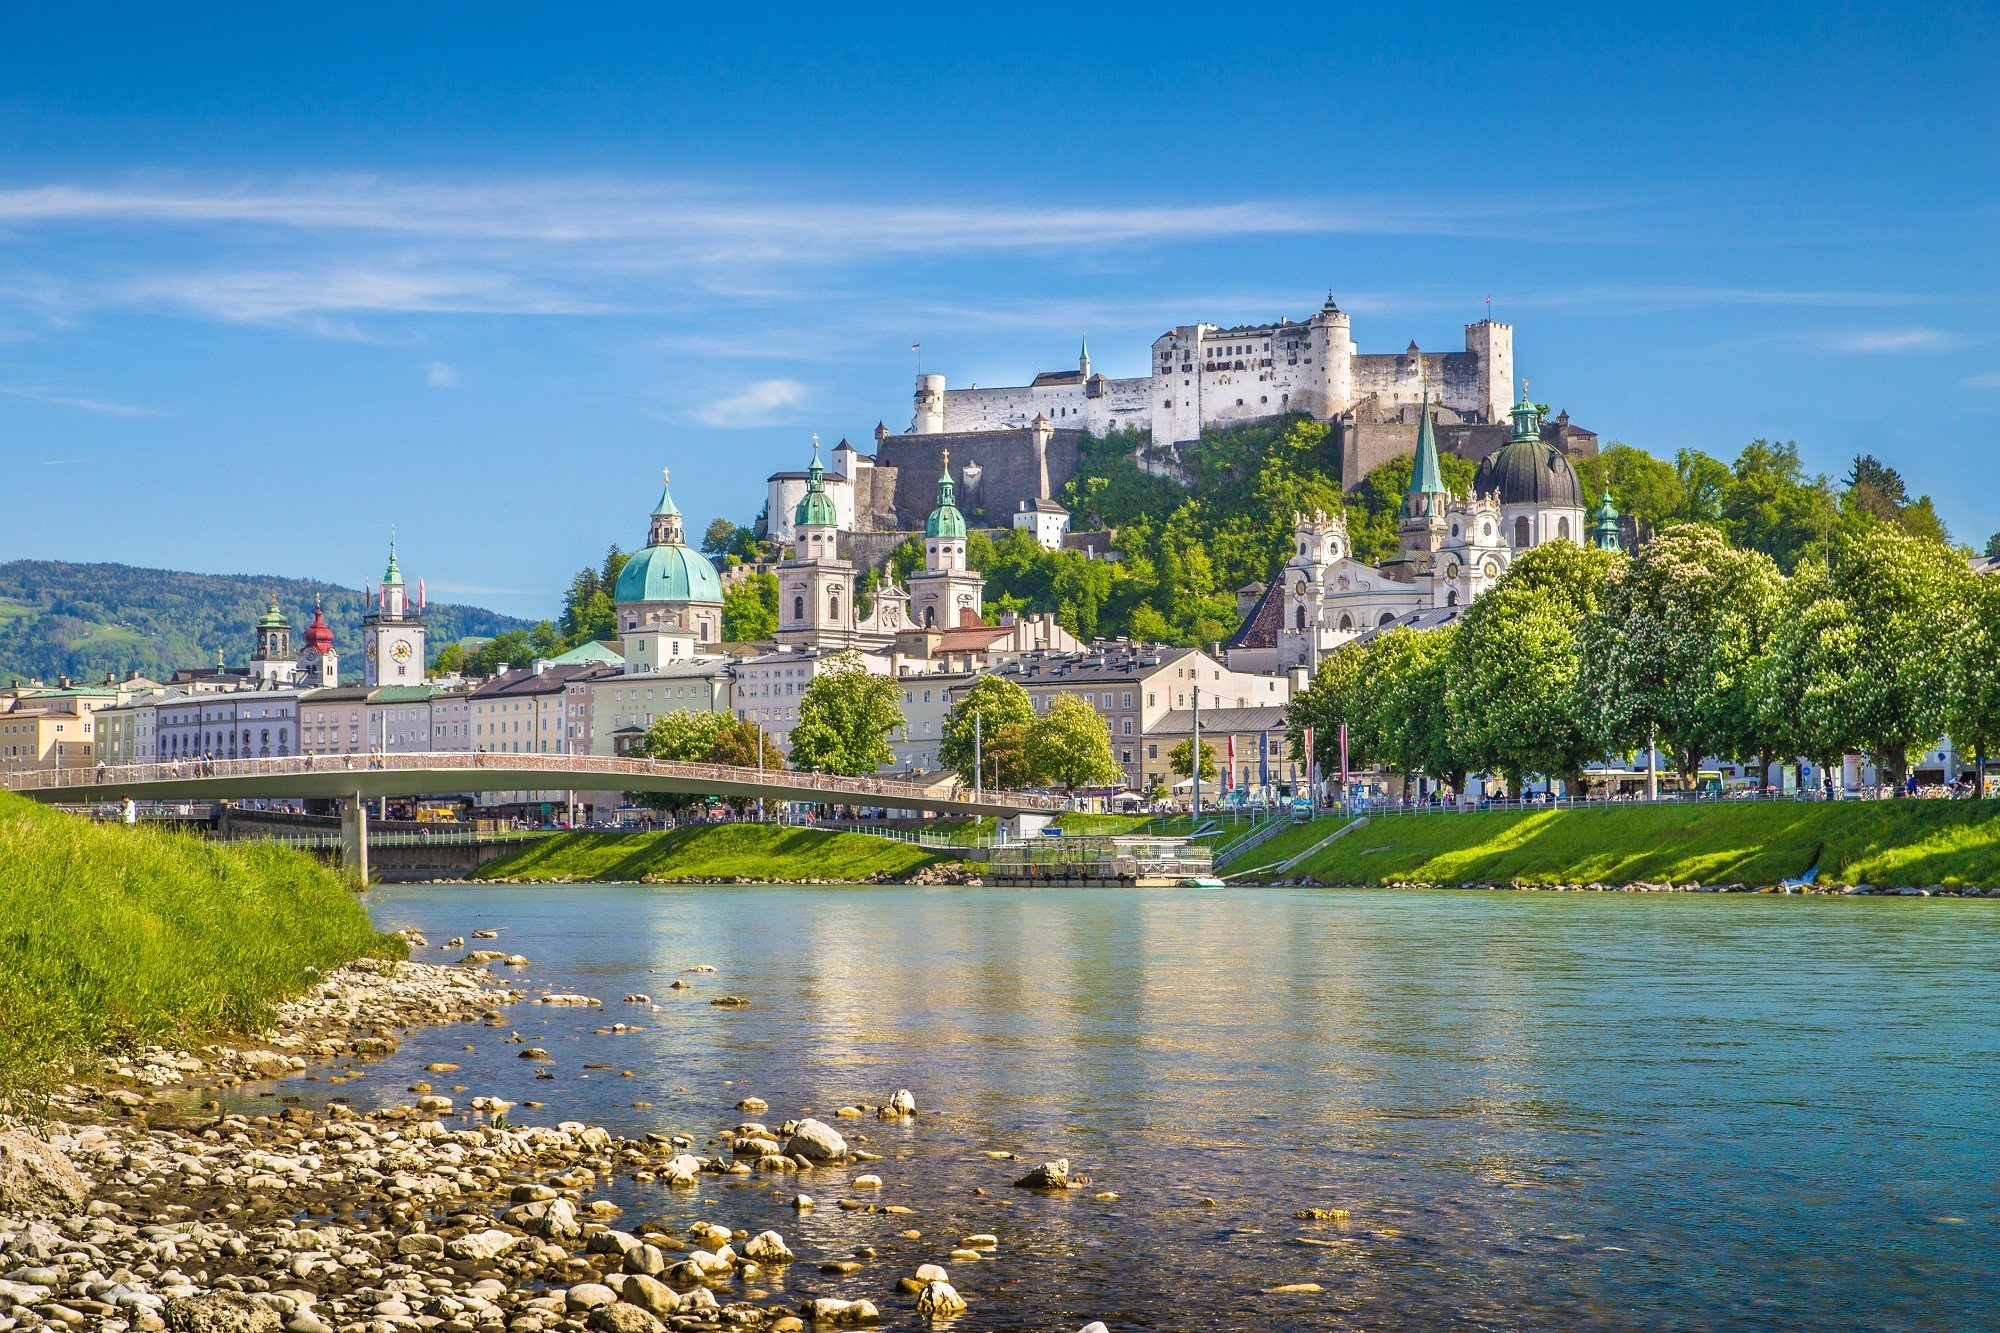 Dagaanbieding - 8 dagen familievakantie o.b.v. ultra all-inclusive nabij Salzburg in Oostenrijk dagelijkse koopjes